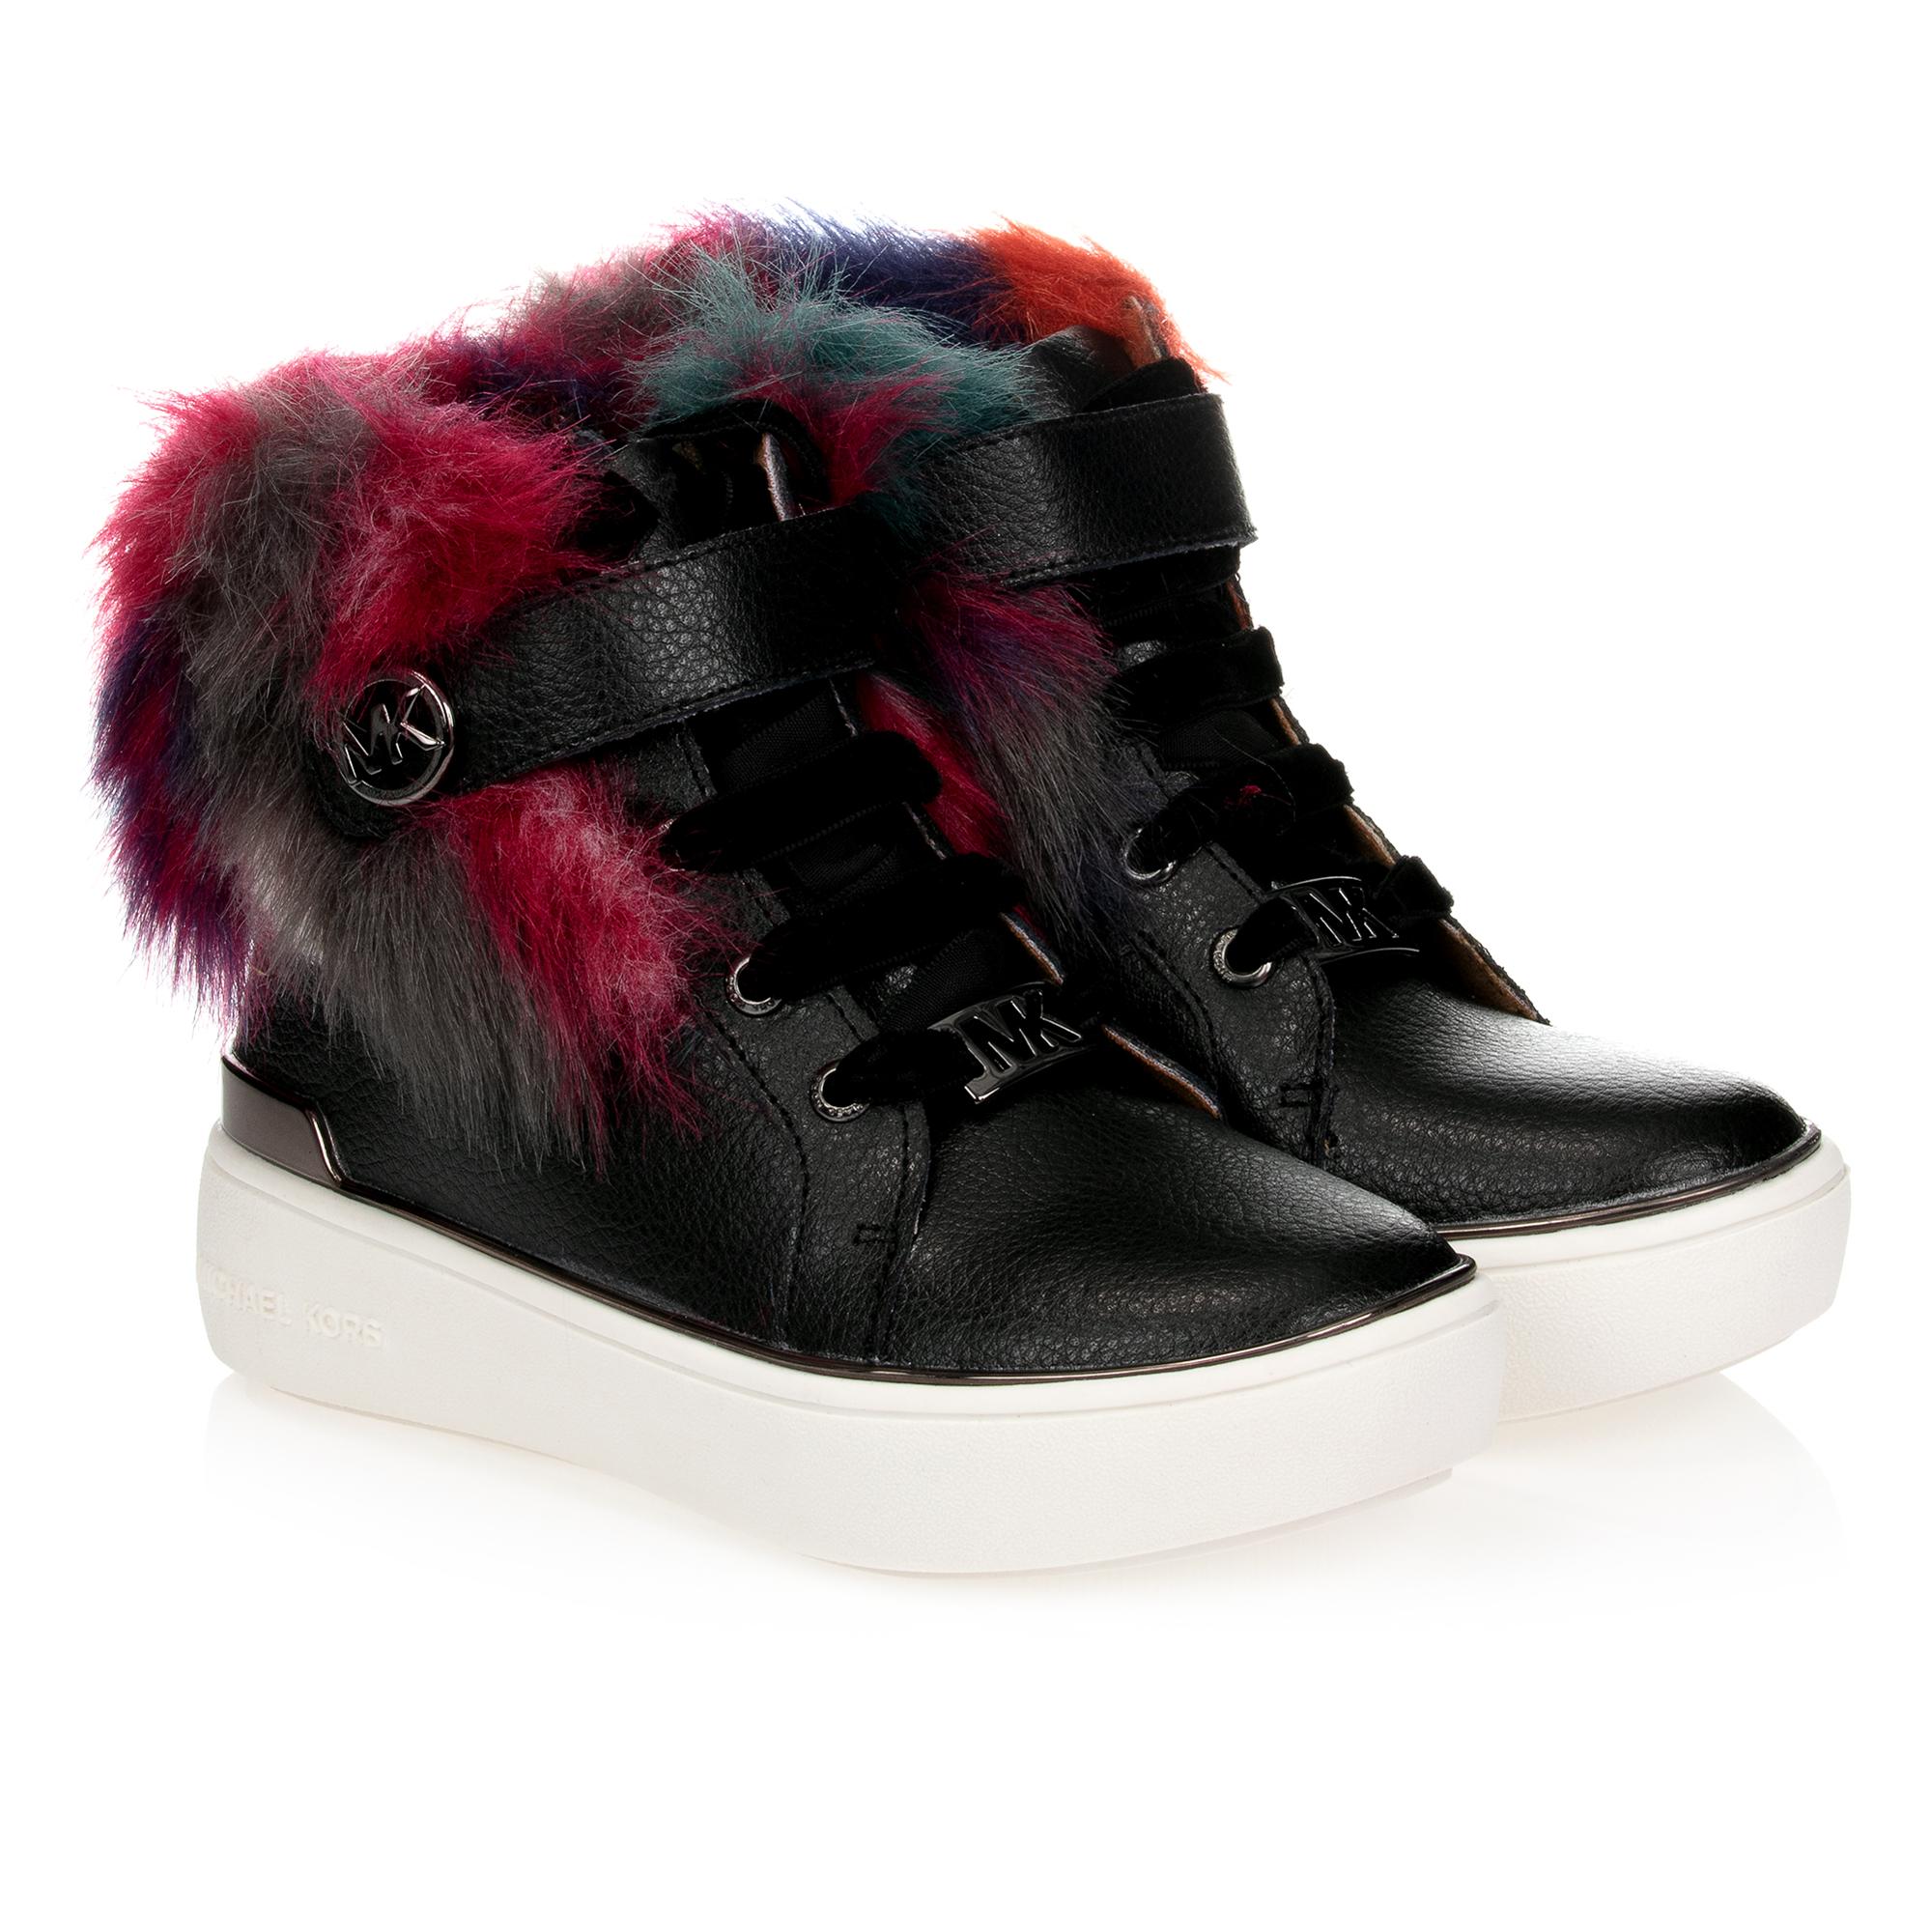 Michael Kors - Girls Black Leather